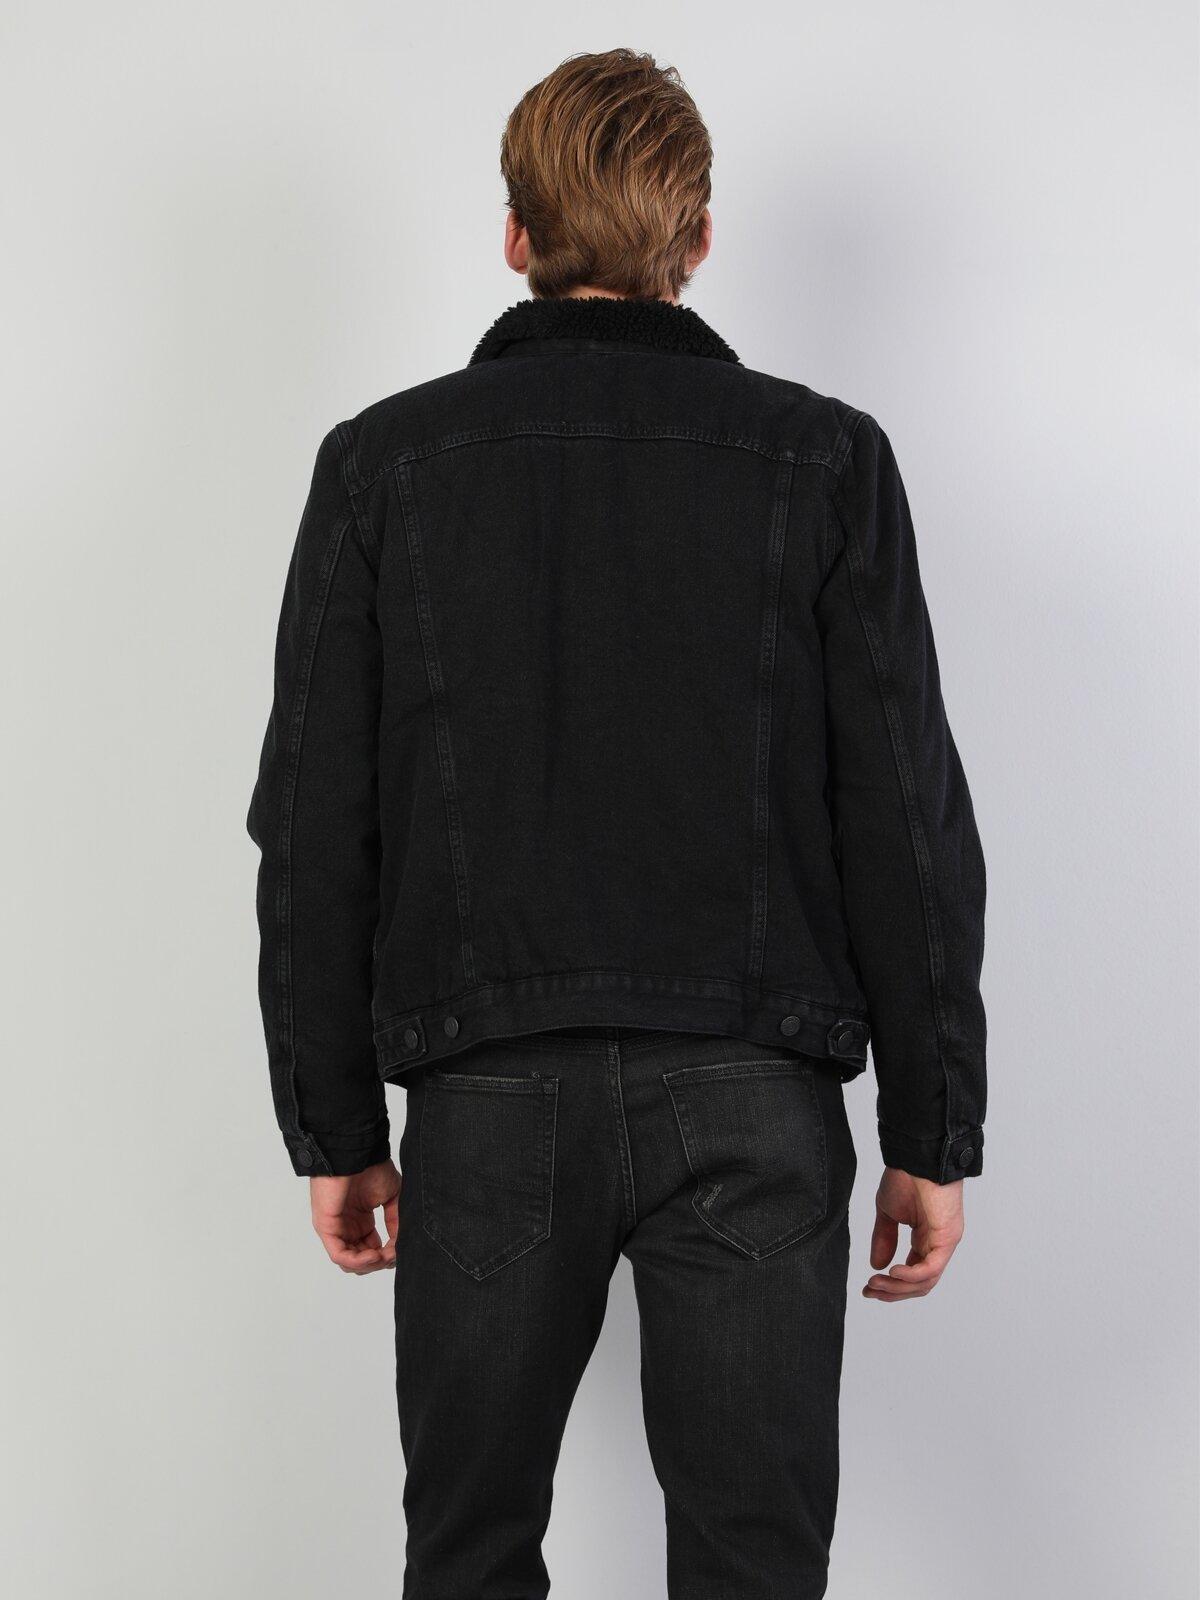 020 Mice Normal Kesim Kürk Yakalı Siyah Erkek Denim Ceket